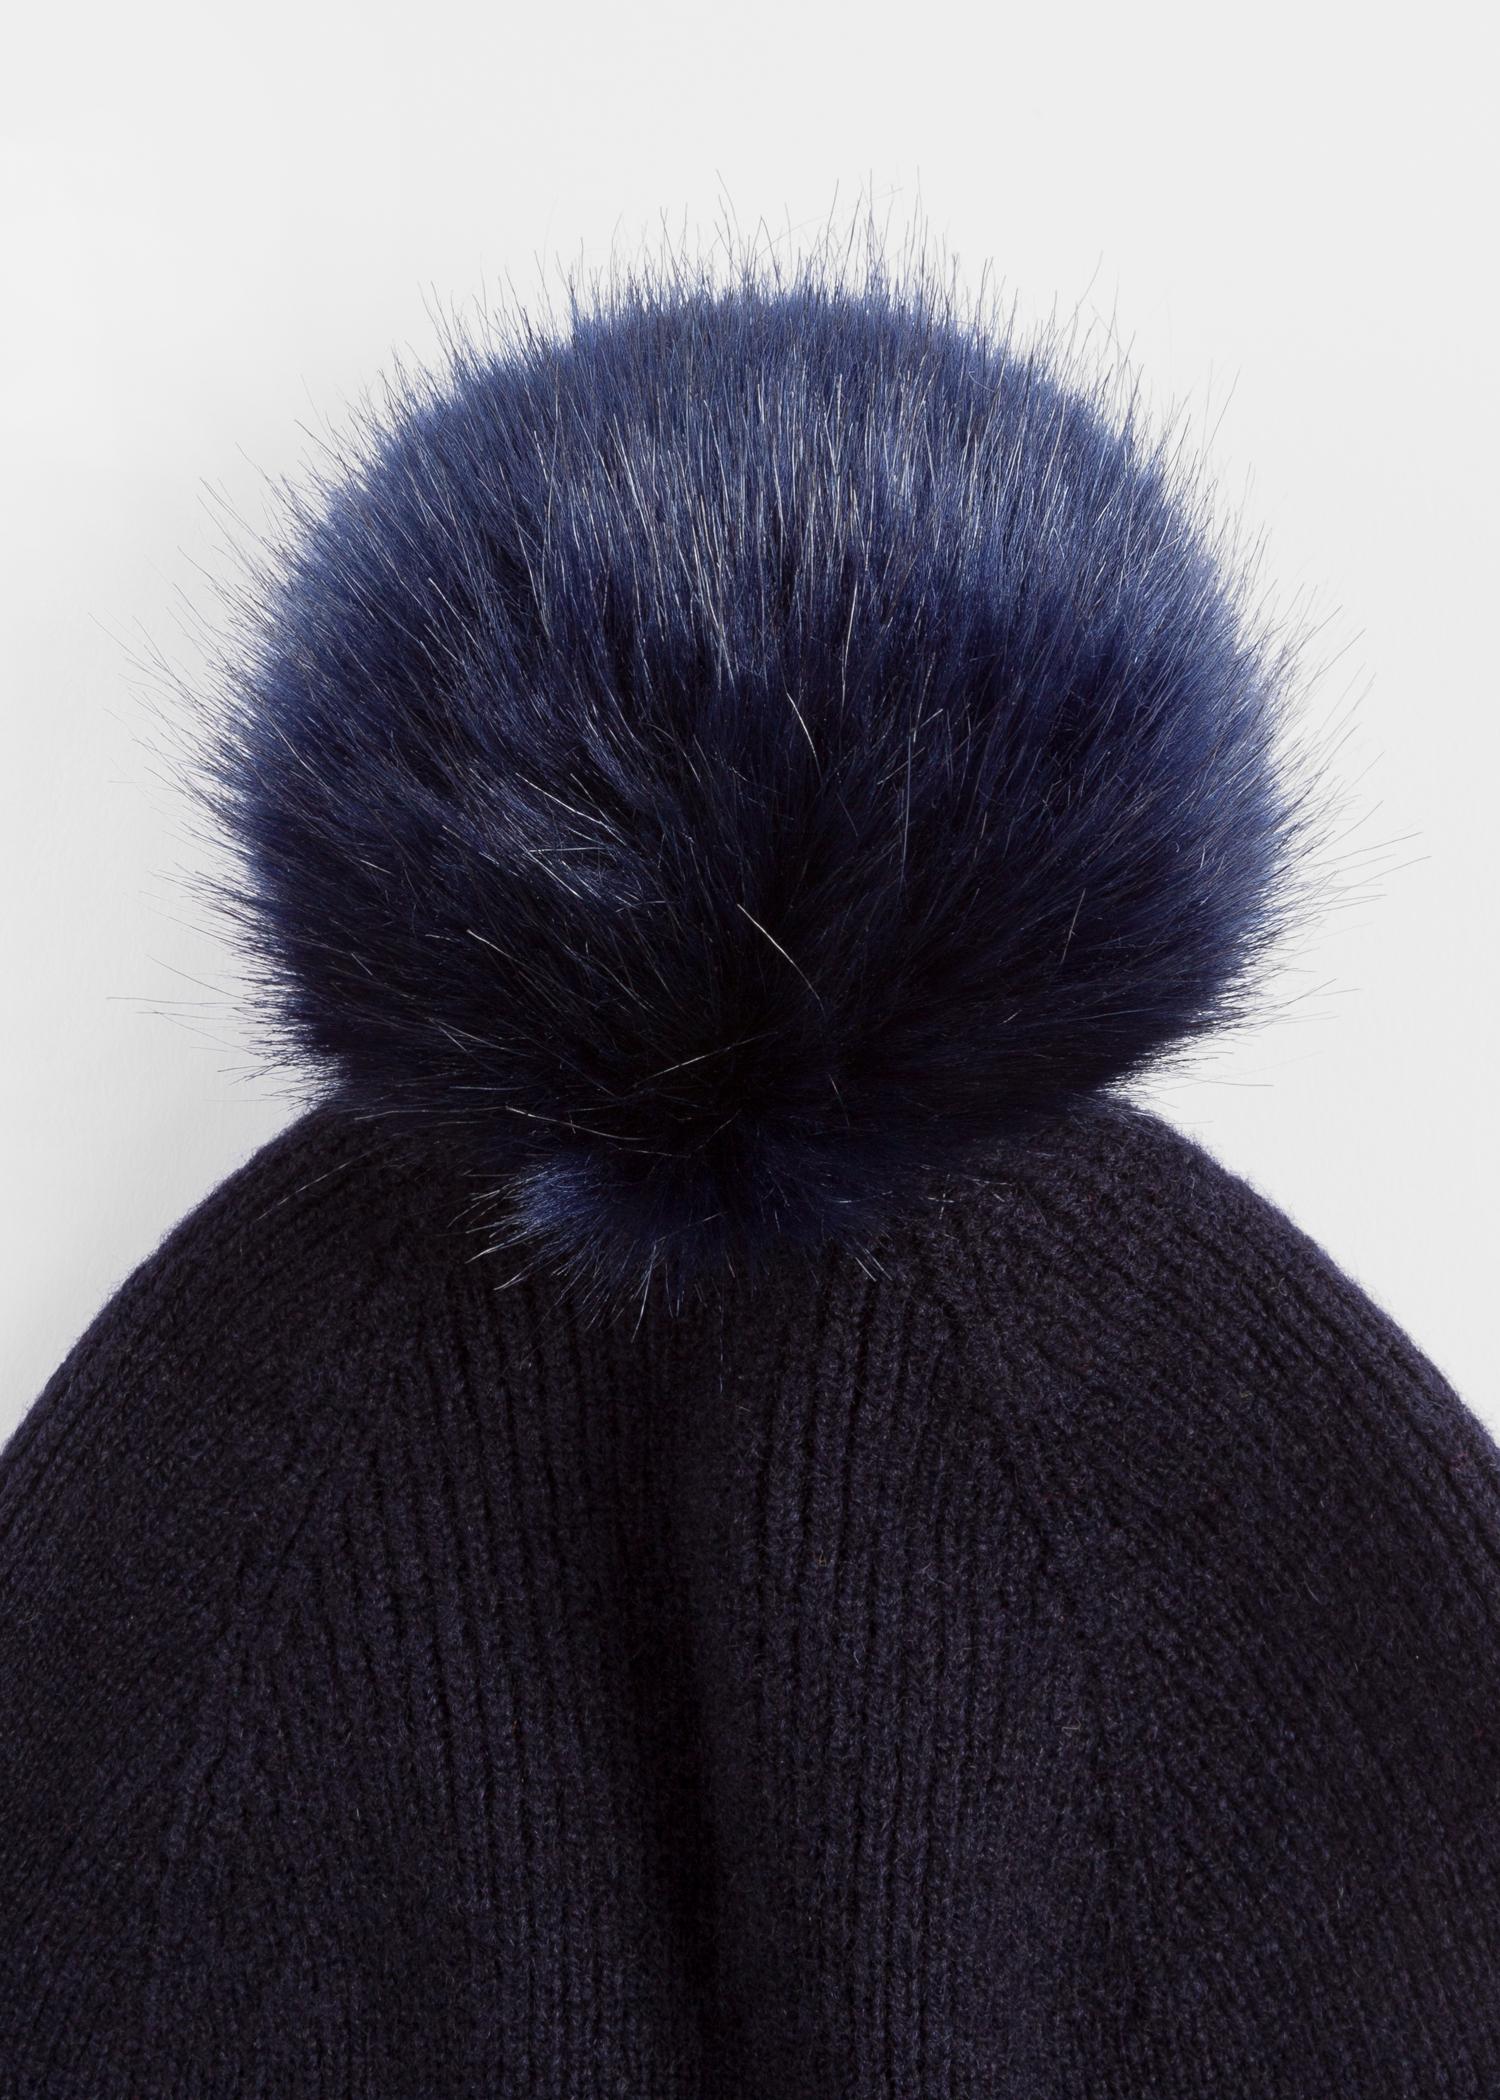 076086b48 Dark Grey Bobble Hat Mens